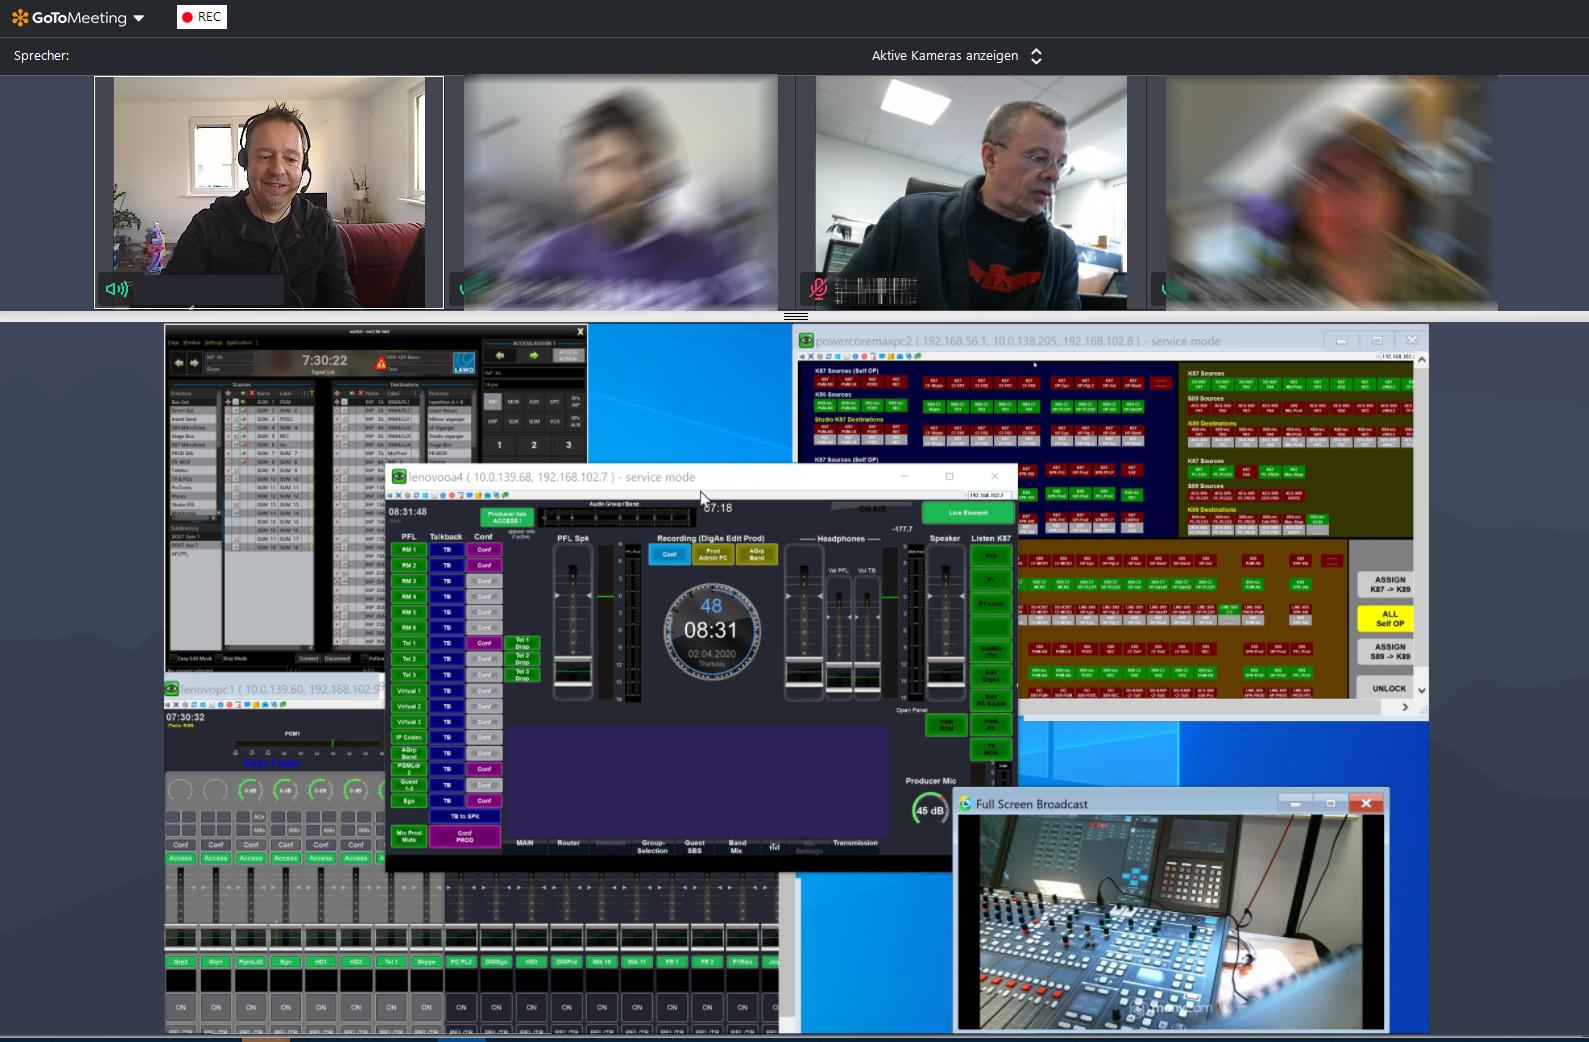 Lawo nimmt Radiosysteme mit virtueller Abnahme in Betrieb